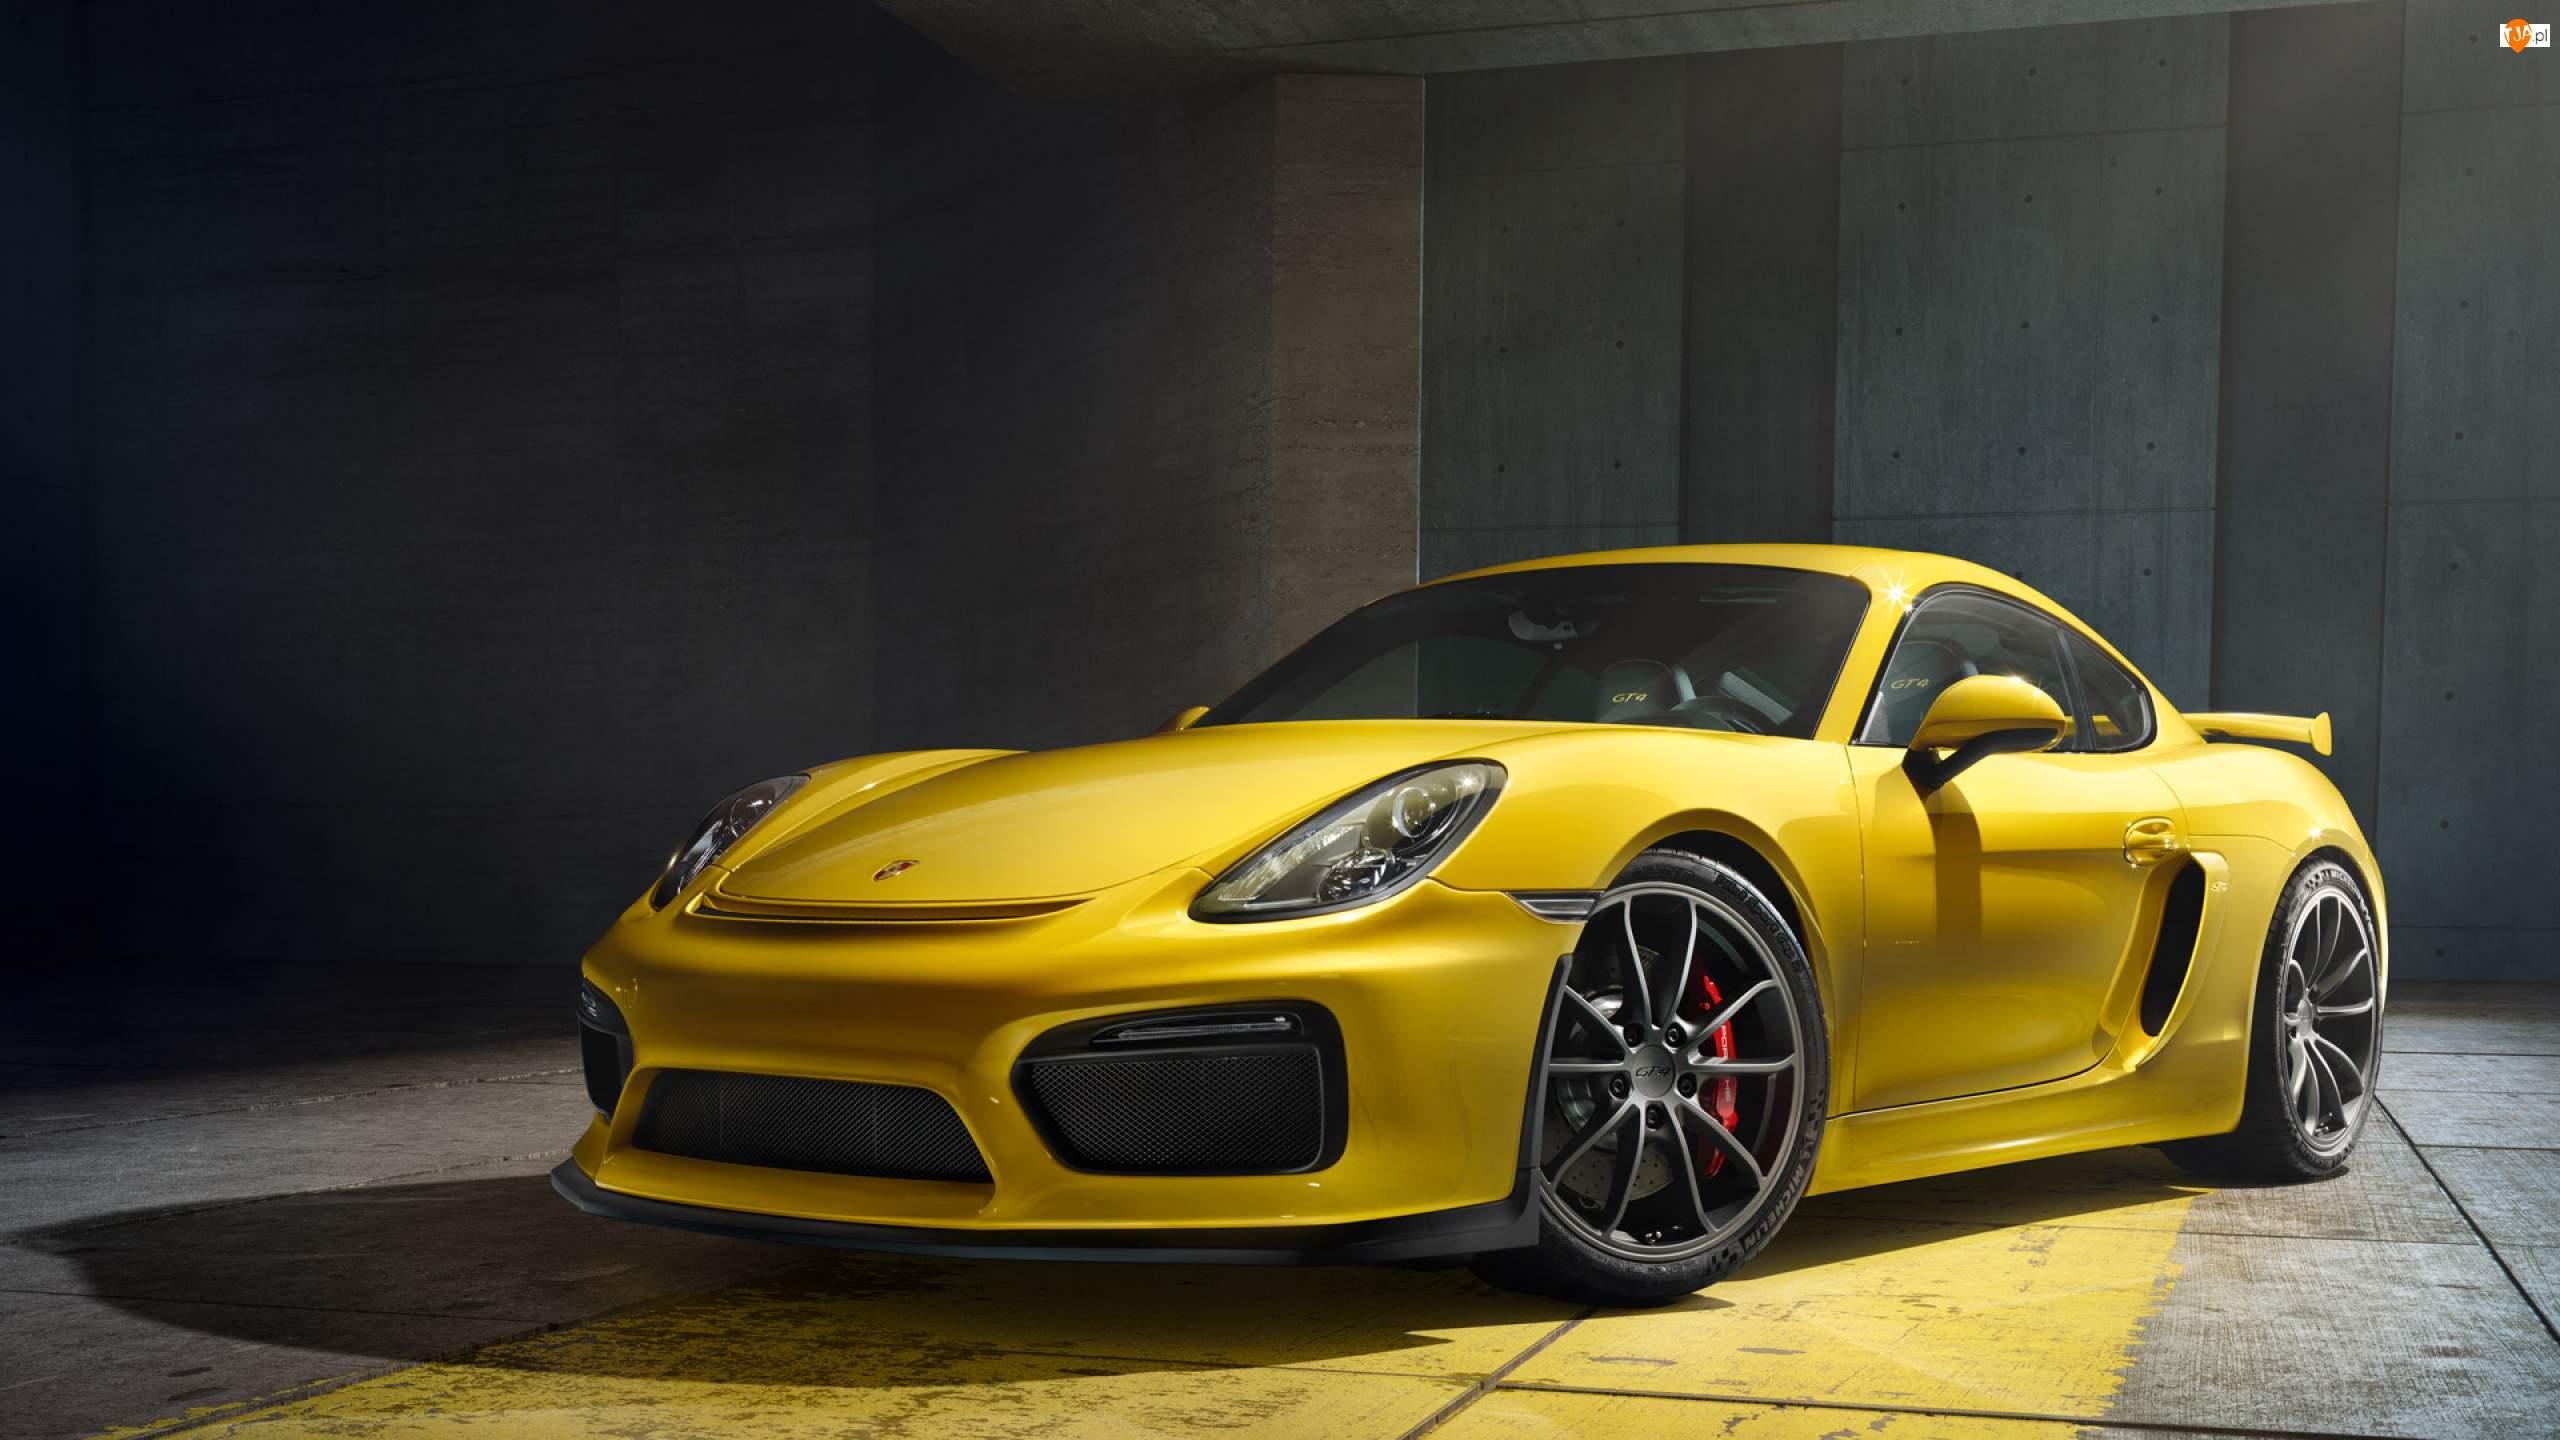 2015, Żółte, Porsche Cayman GT4